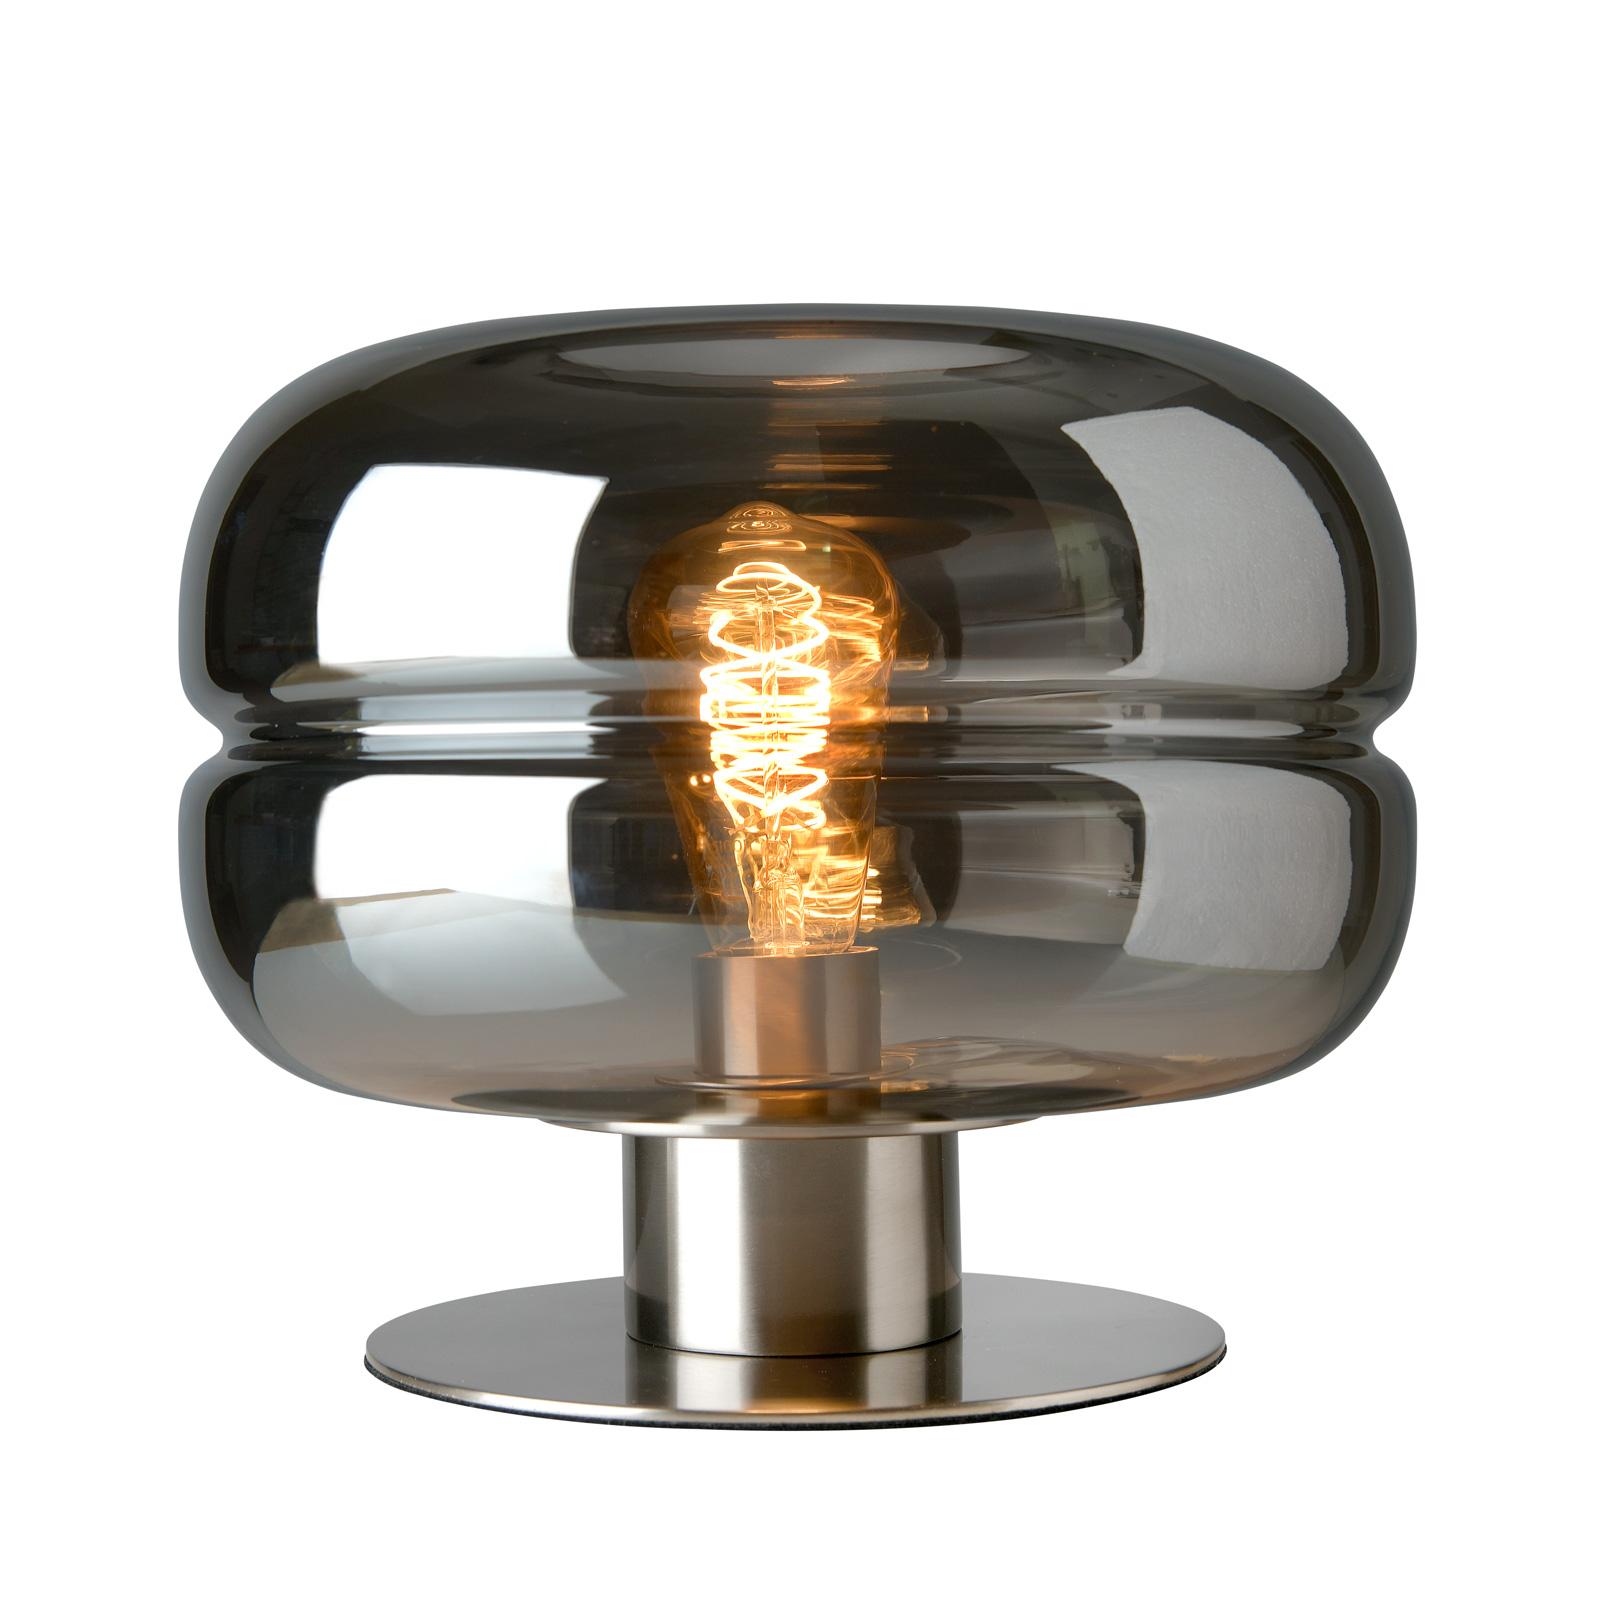 Villeroy & Boch Havanna pöytälamppu, satiini, 24cm